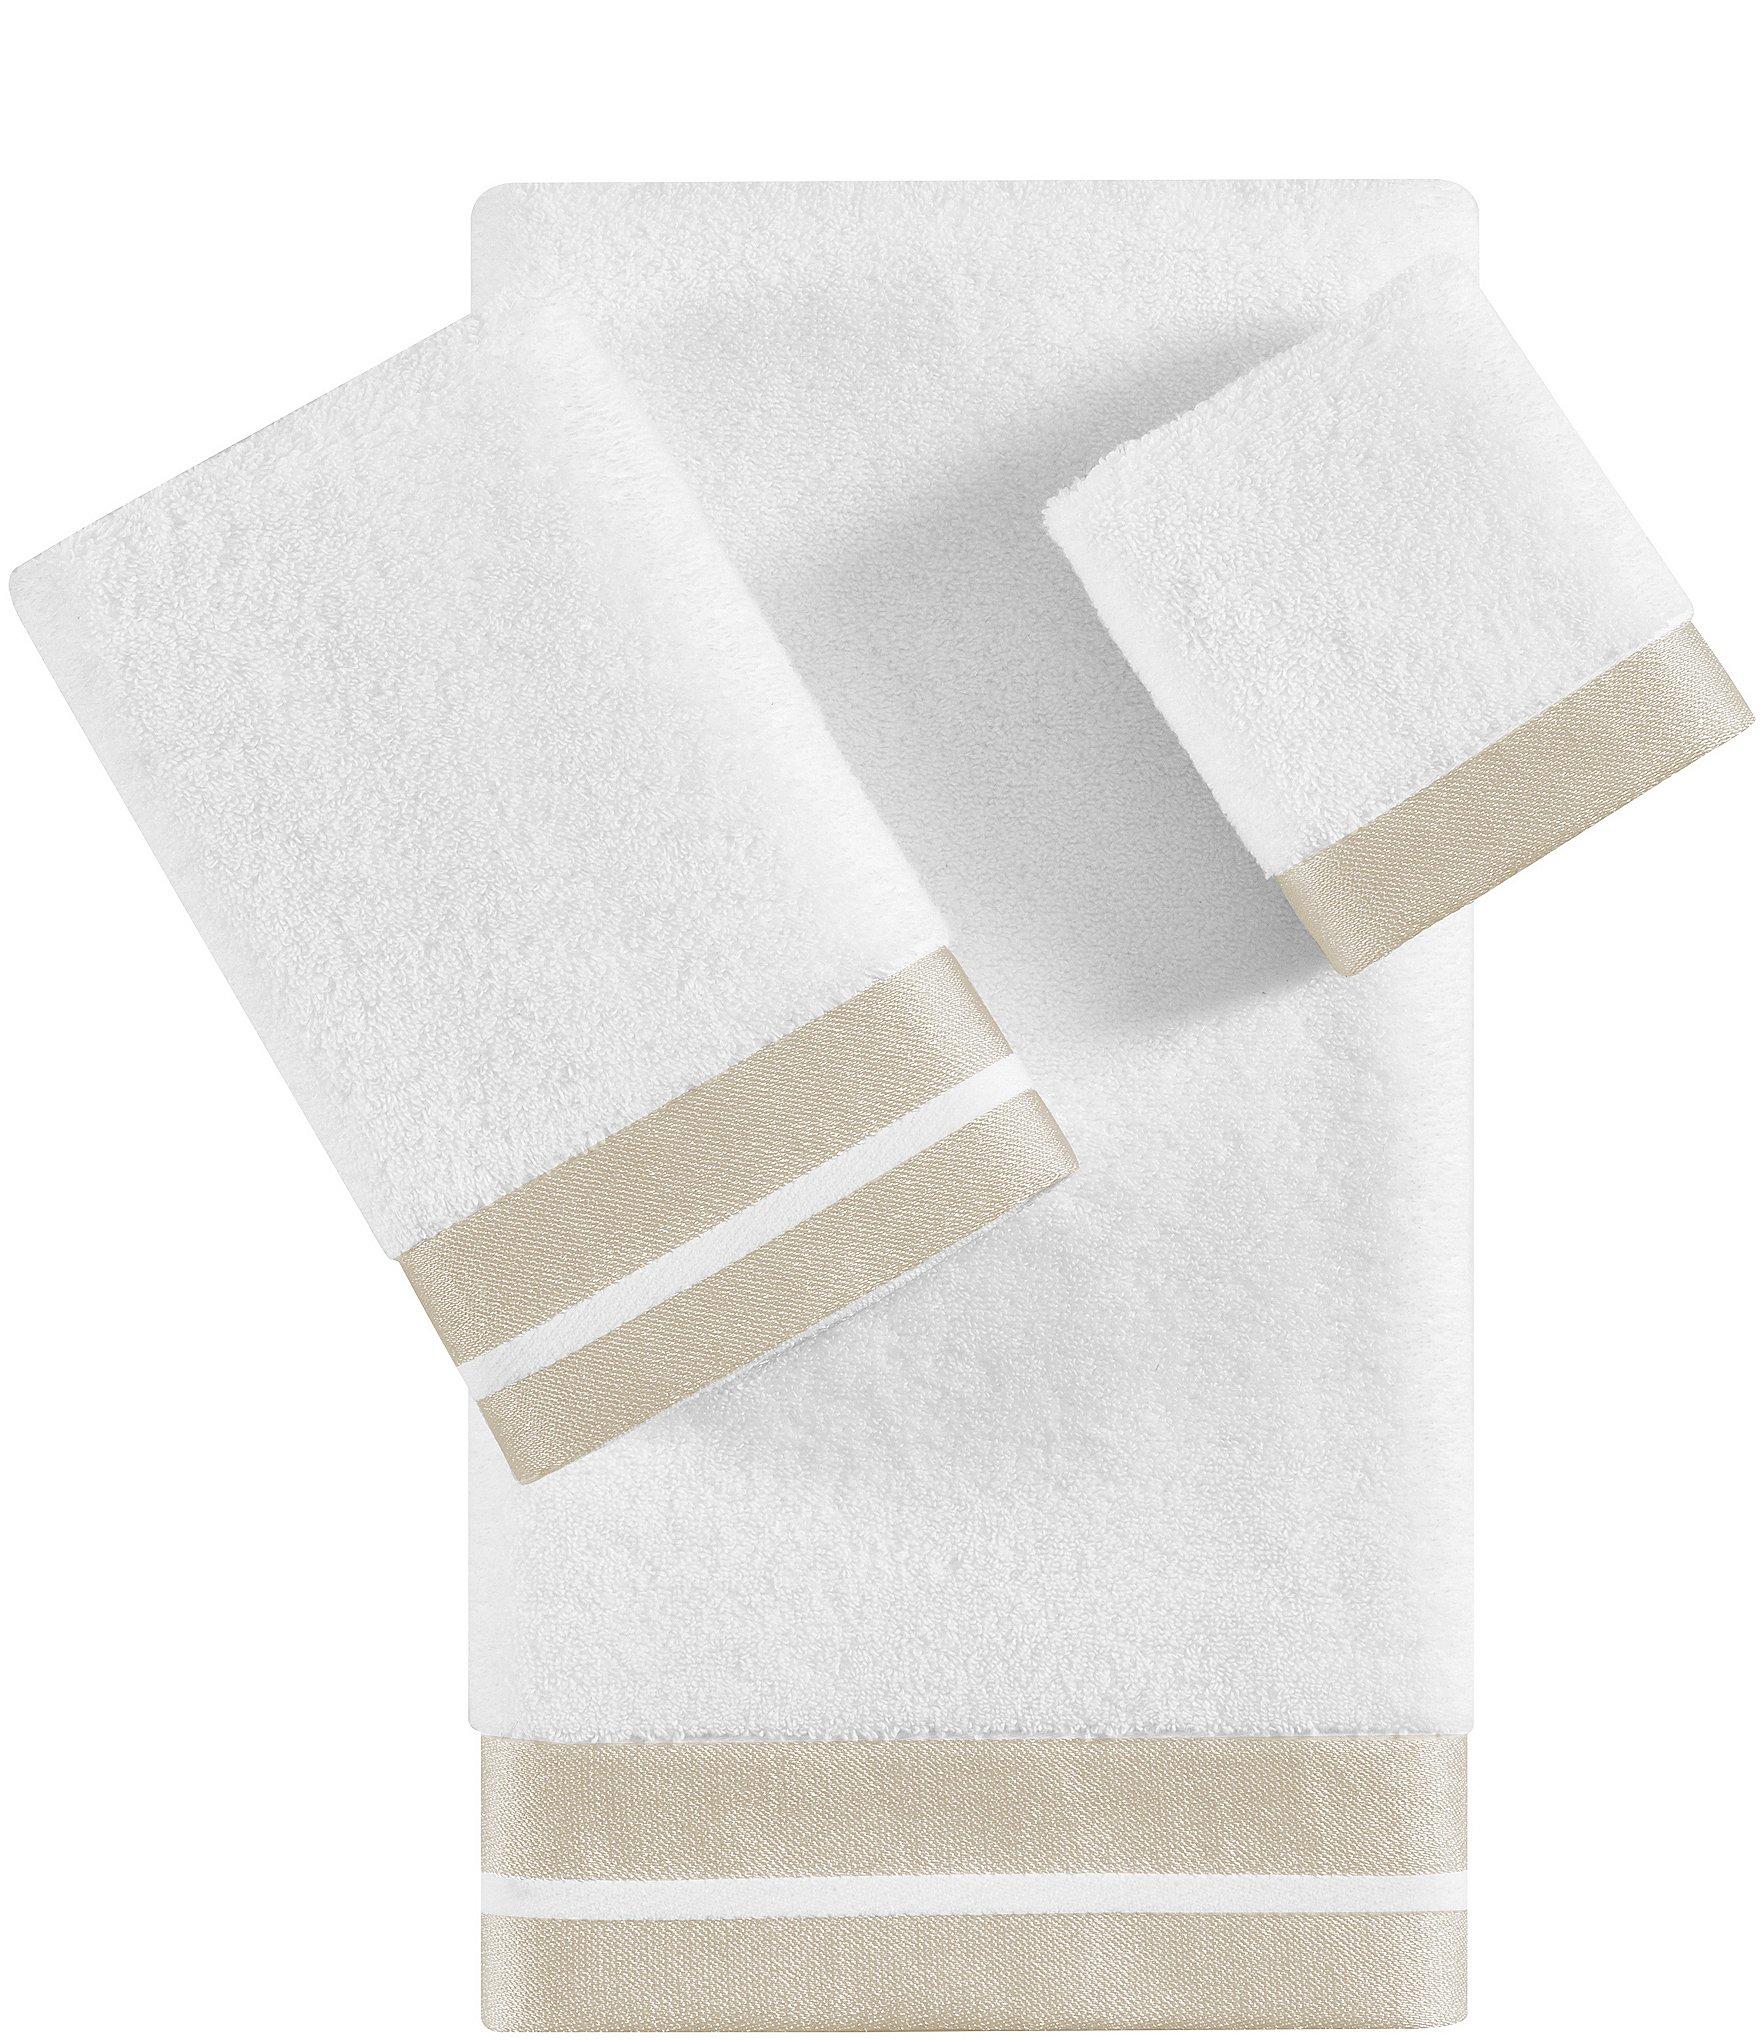 Bath Towels, Shower Curtains & Bath Accessories | Dillards